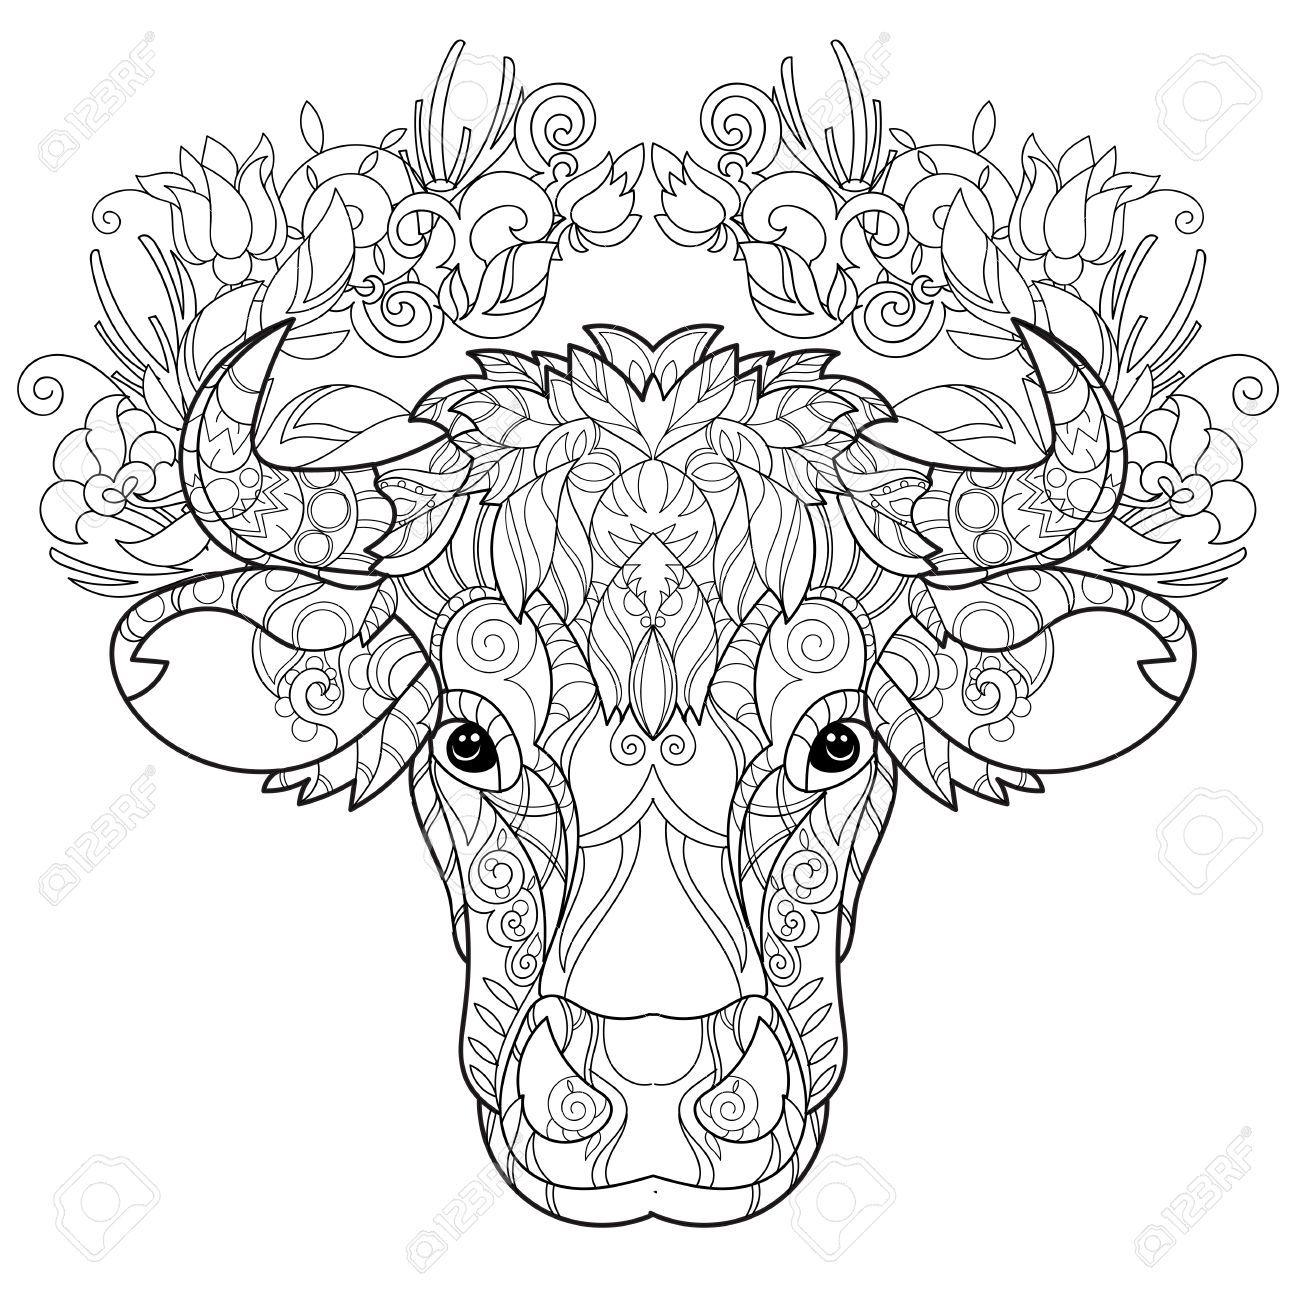 Decorated Cow Heads Google Search Mandala Kleurplaten Koeien Kunst Kleurplaten